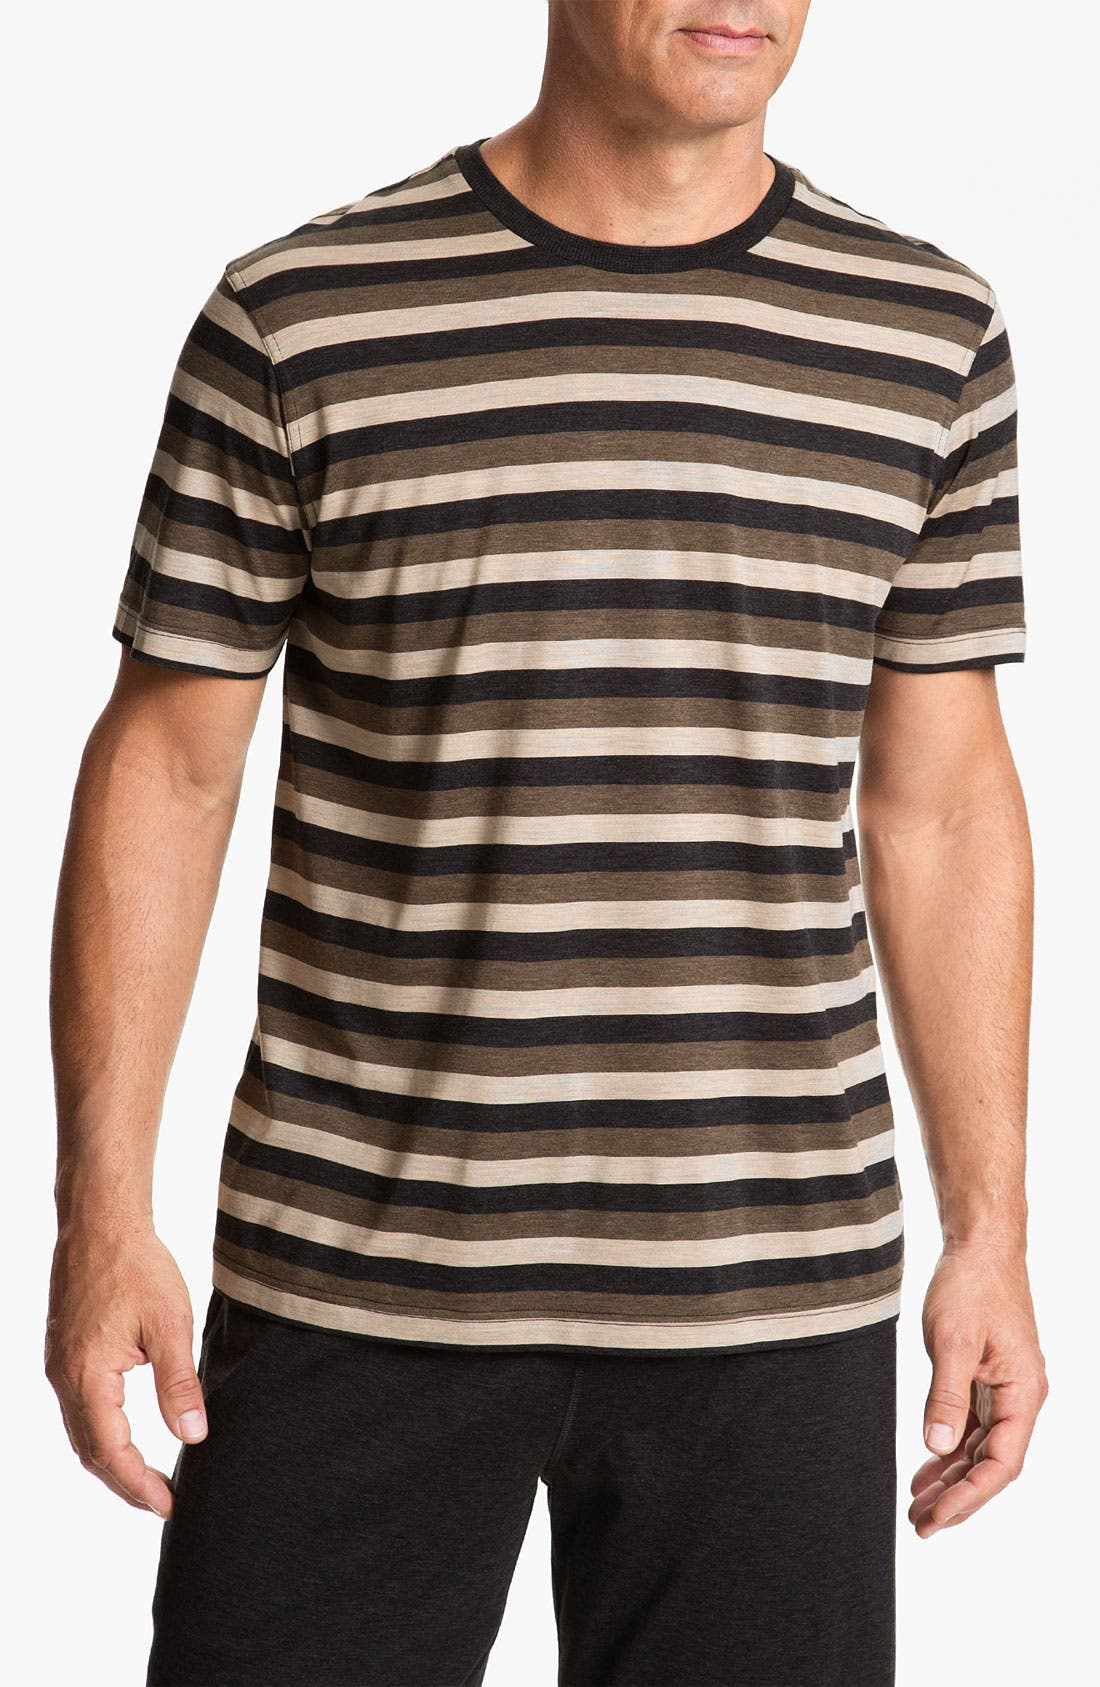 Main Image - Daniel Buchler Silk Blend Heathered Stripe T-Shirt